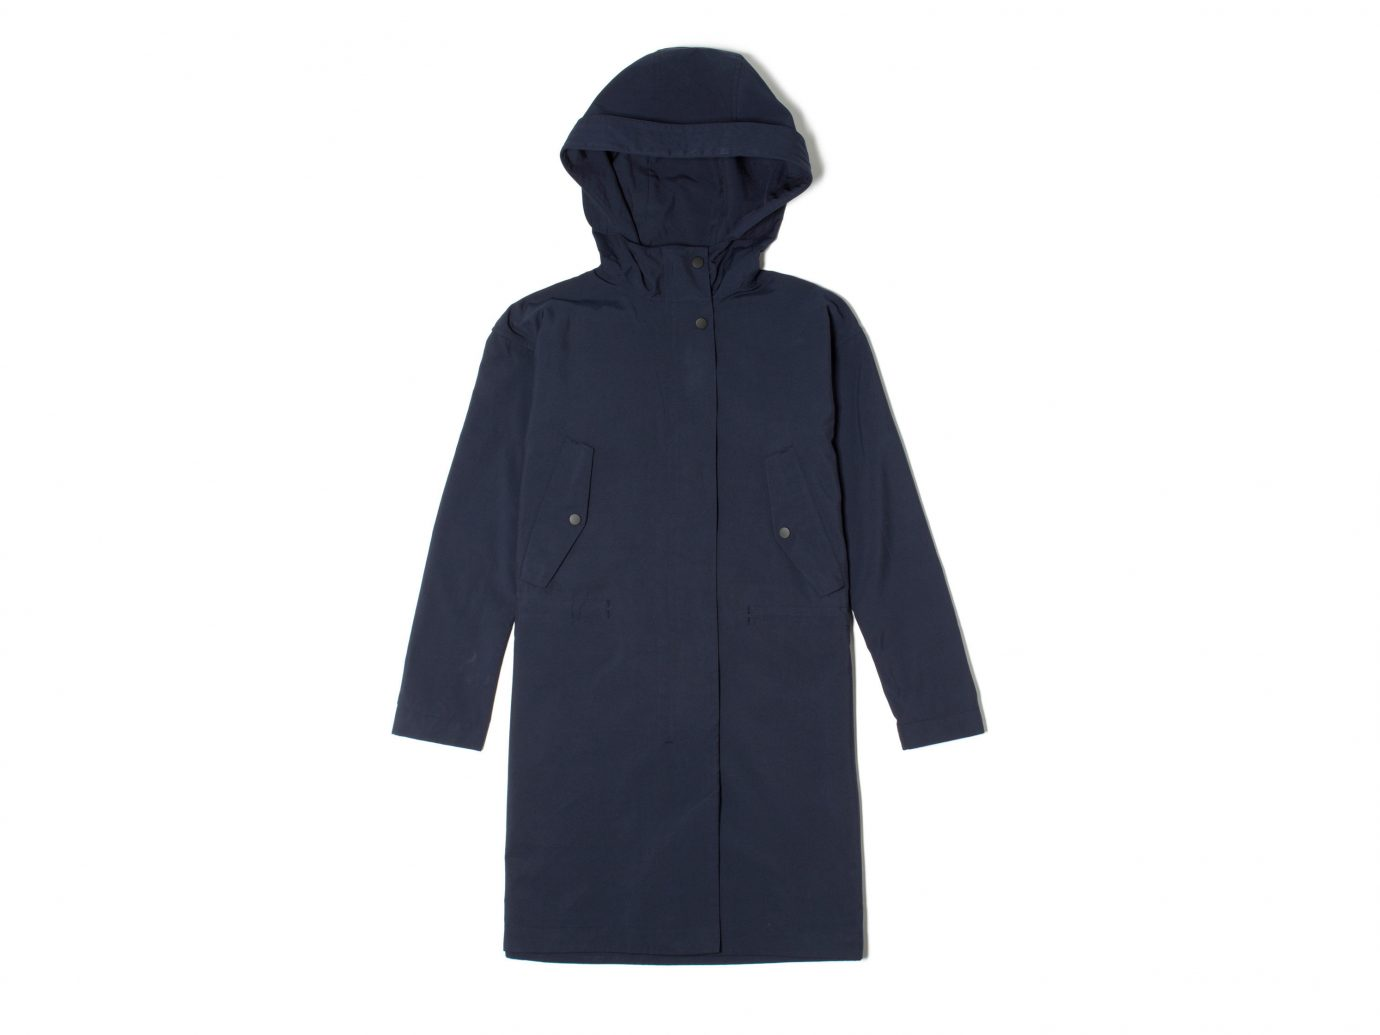 Travel Shop clothing hood coat outerwear product overcoat jacket neck